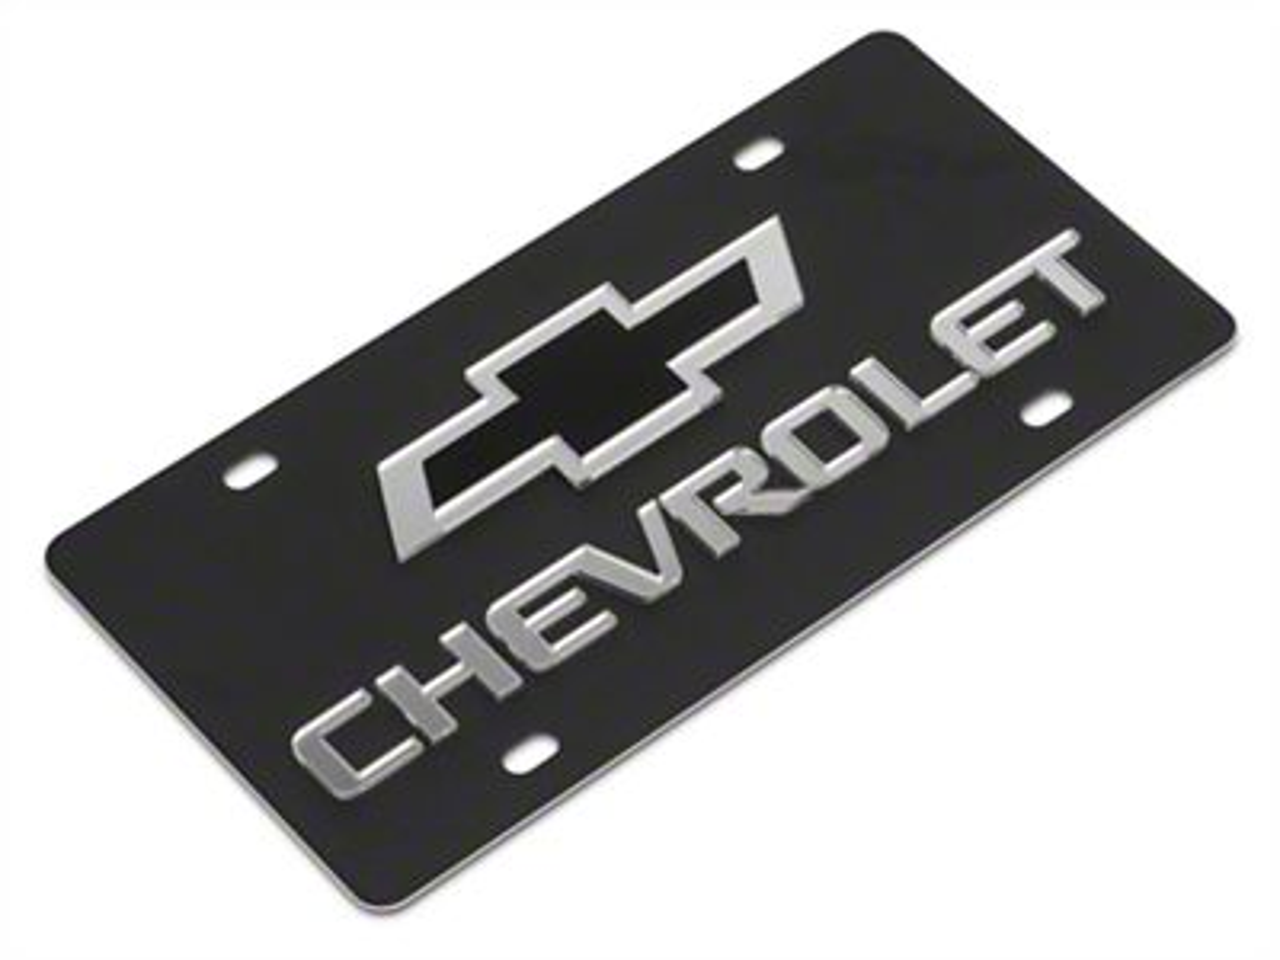 SpeedForm Carbon Steel License Plate w/ Black Bowtie Chervolet Logo (99-18 Silverado 1500)